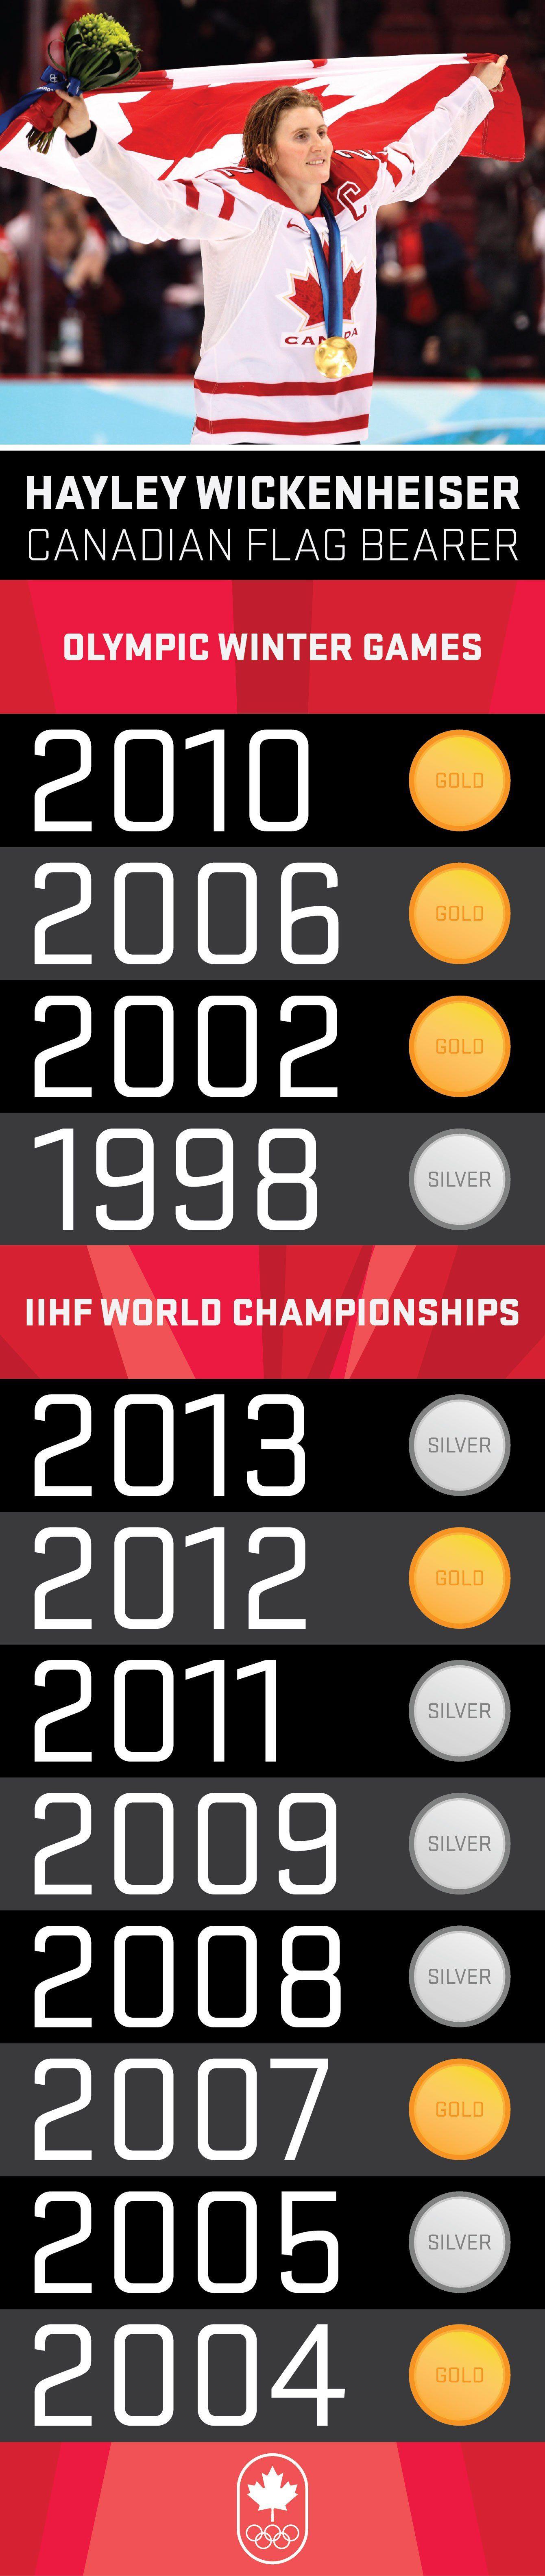 Sochi 2014 - Canadian Olympic Team Flag Bearer - Hayley Wickenheiser Infographic